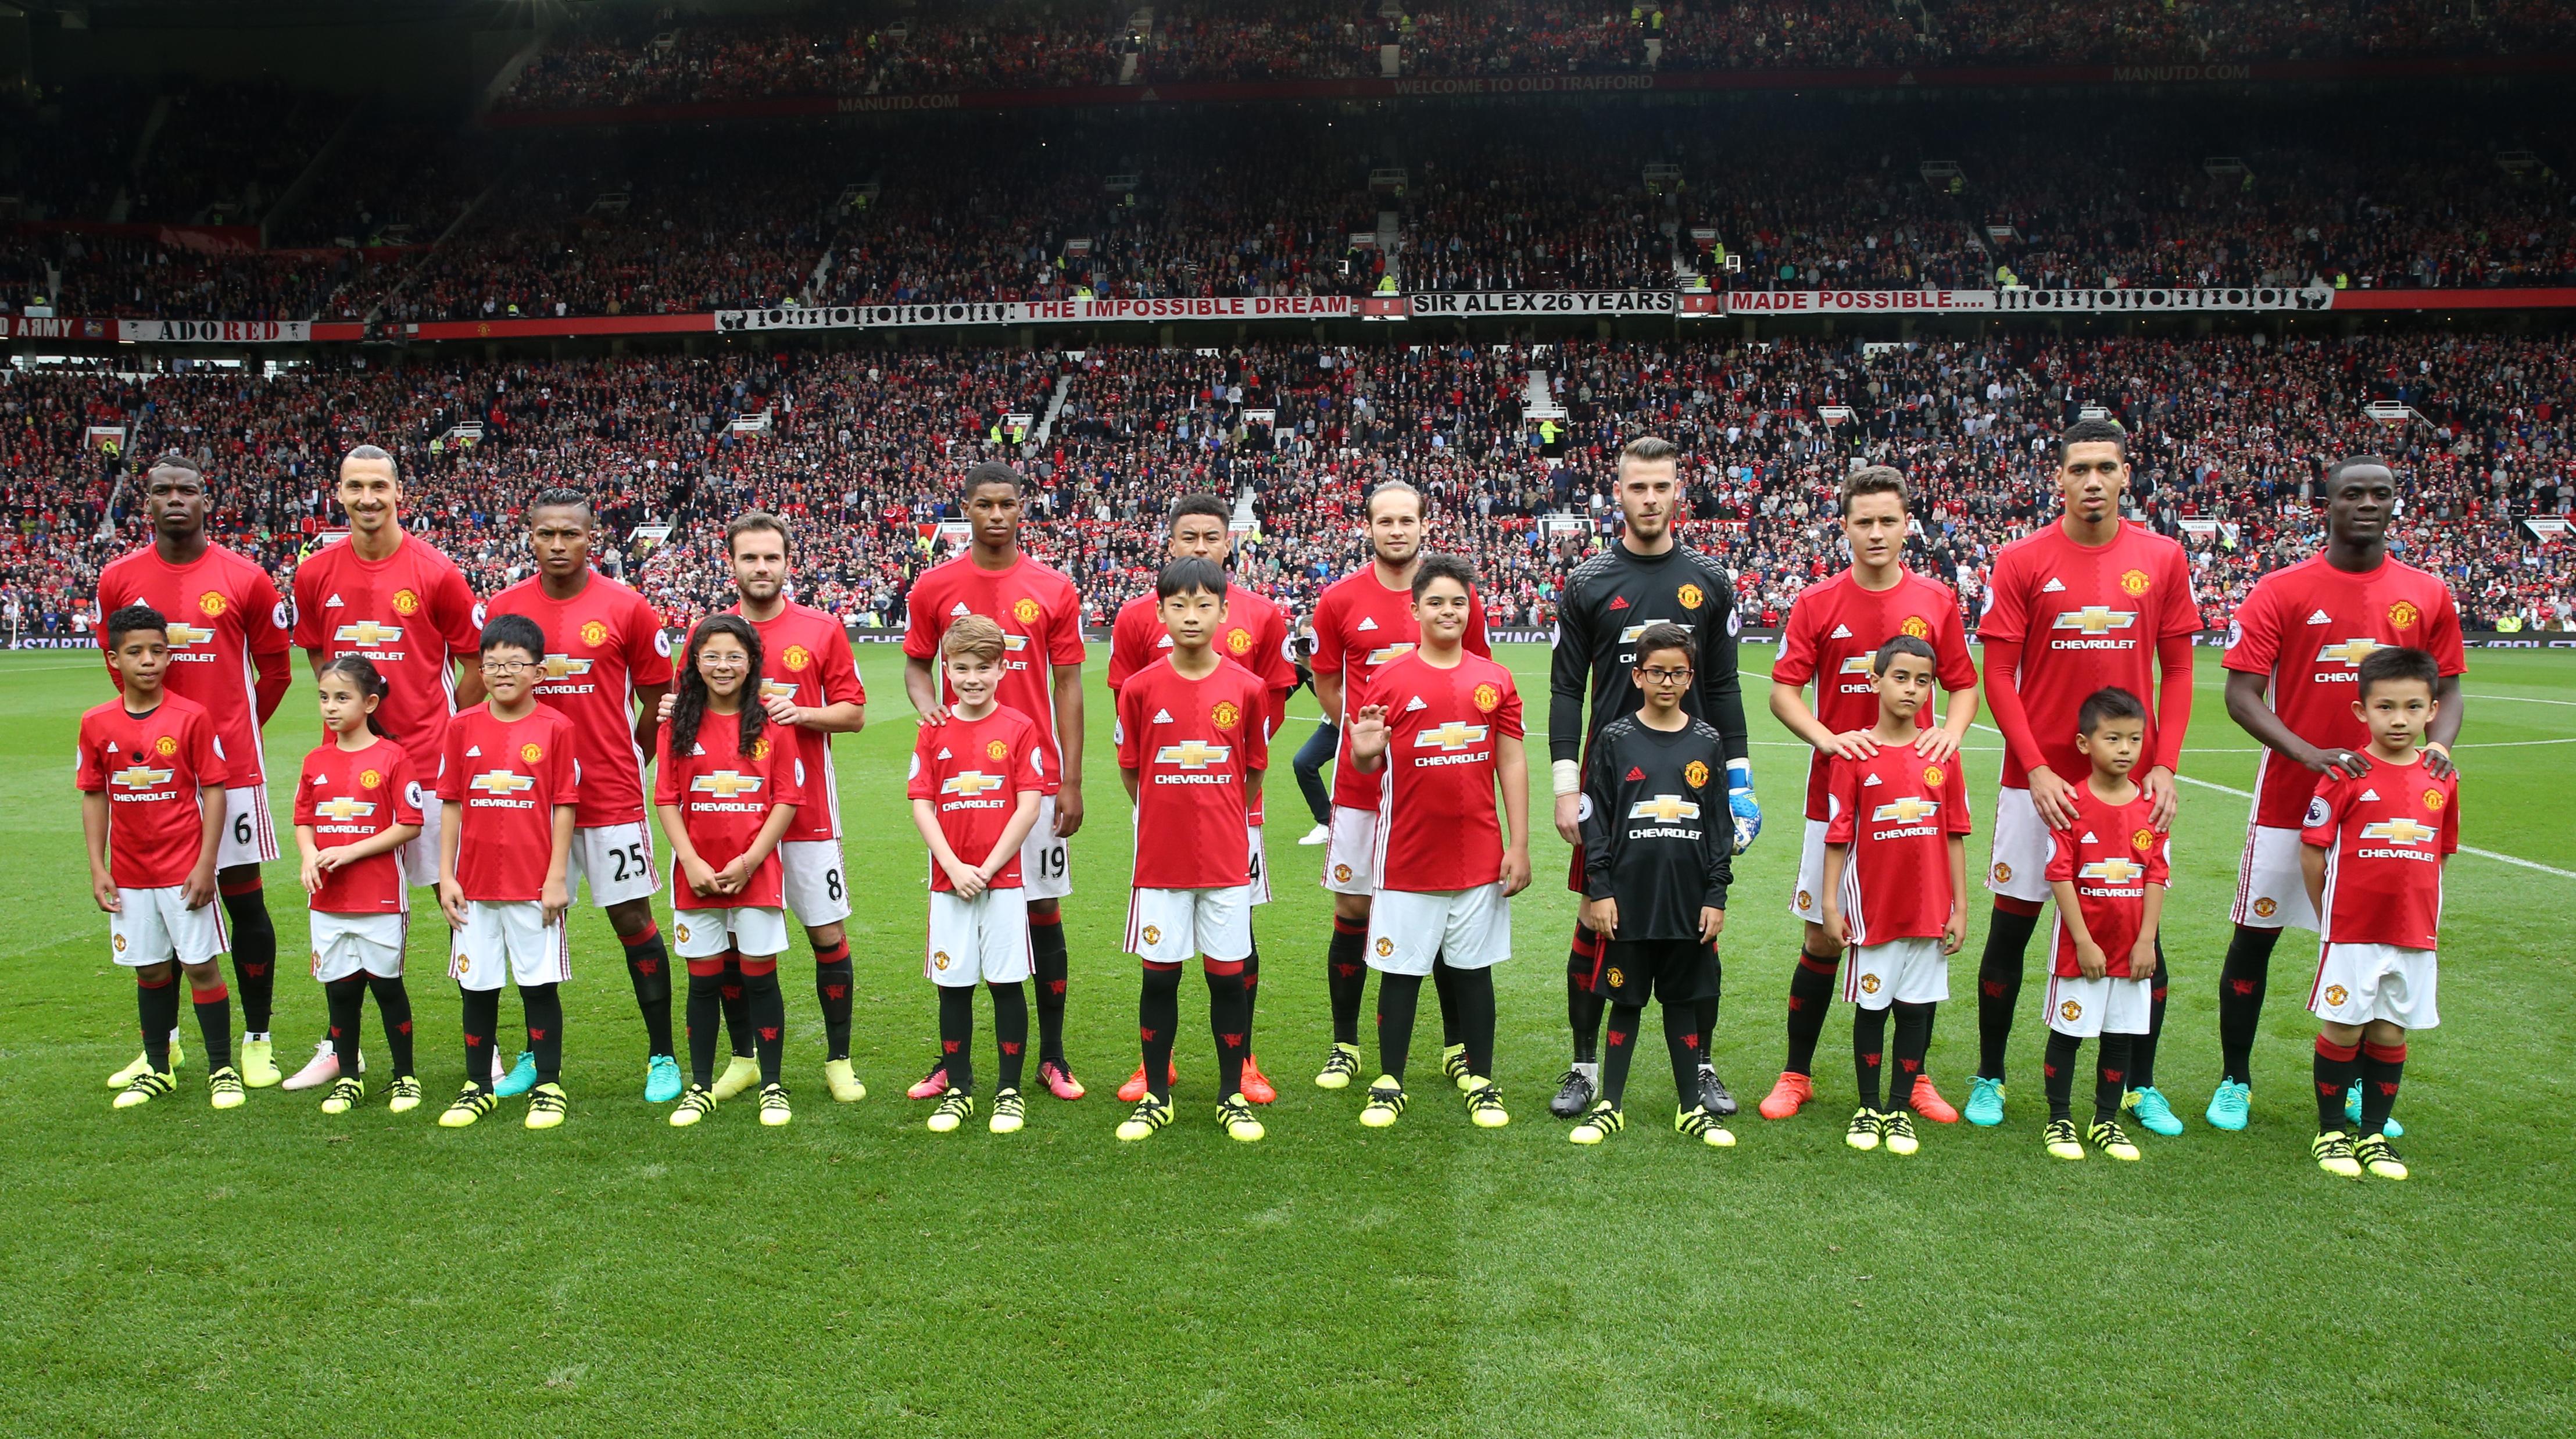 Hilo del Manchester United Chevrolet-Manchester-United-Mascots-01